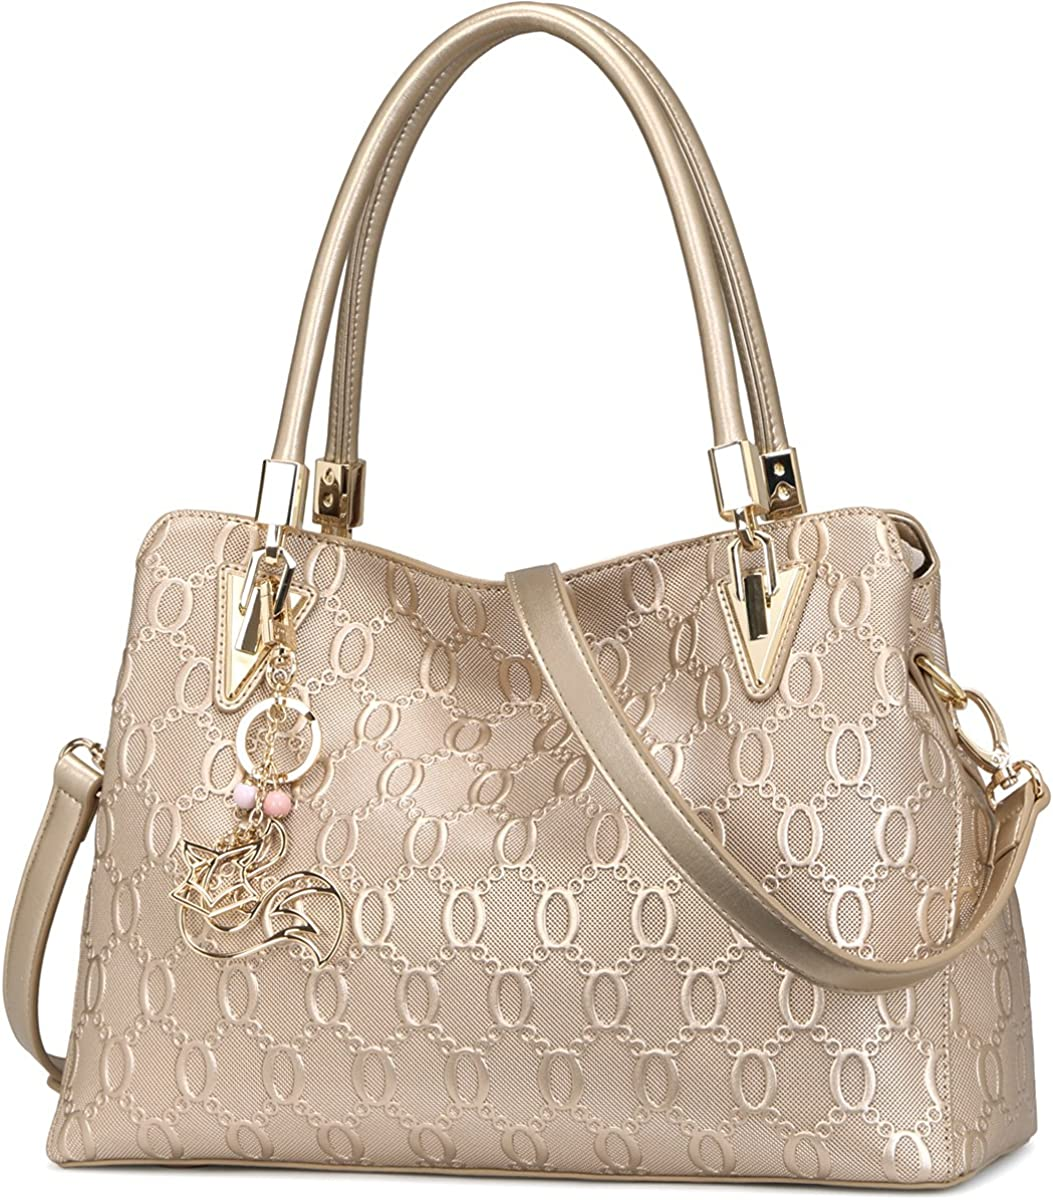 Genuine Leather Handbag for Women, Ladies Top-handle Tote Crossbody Shoulder Bag